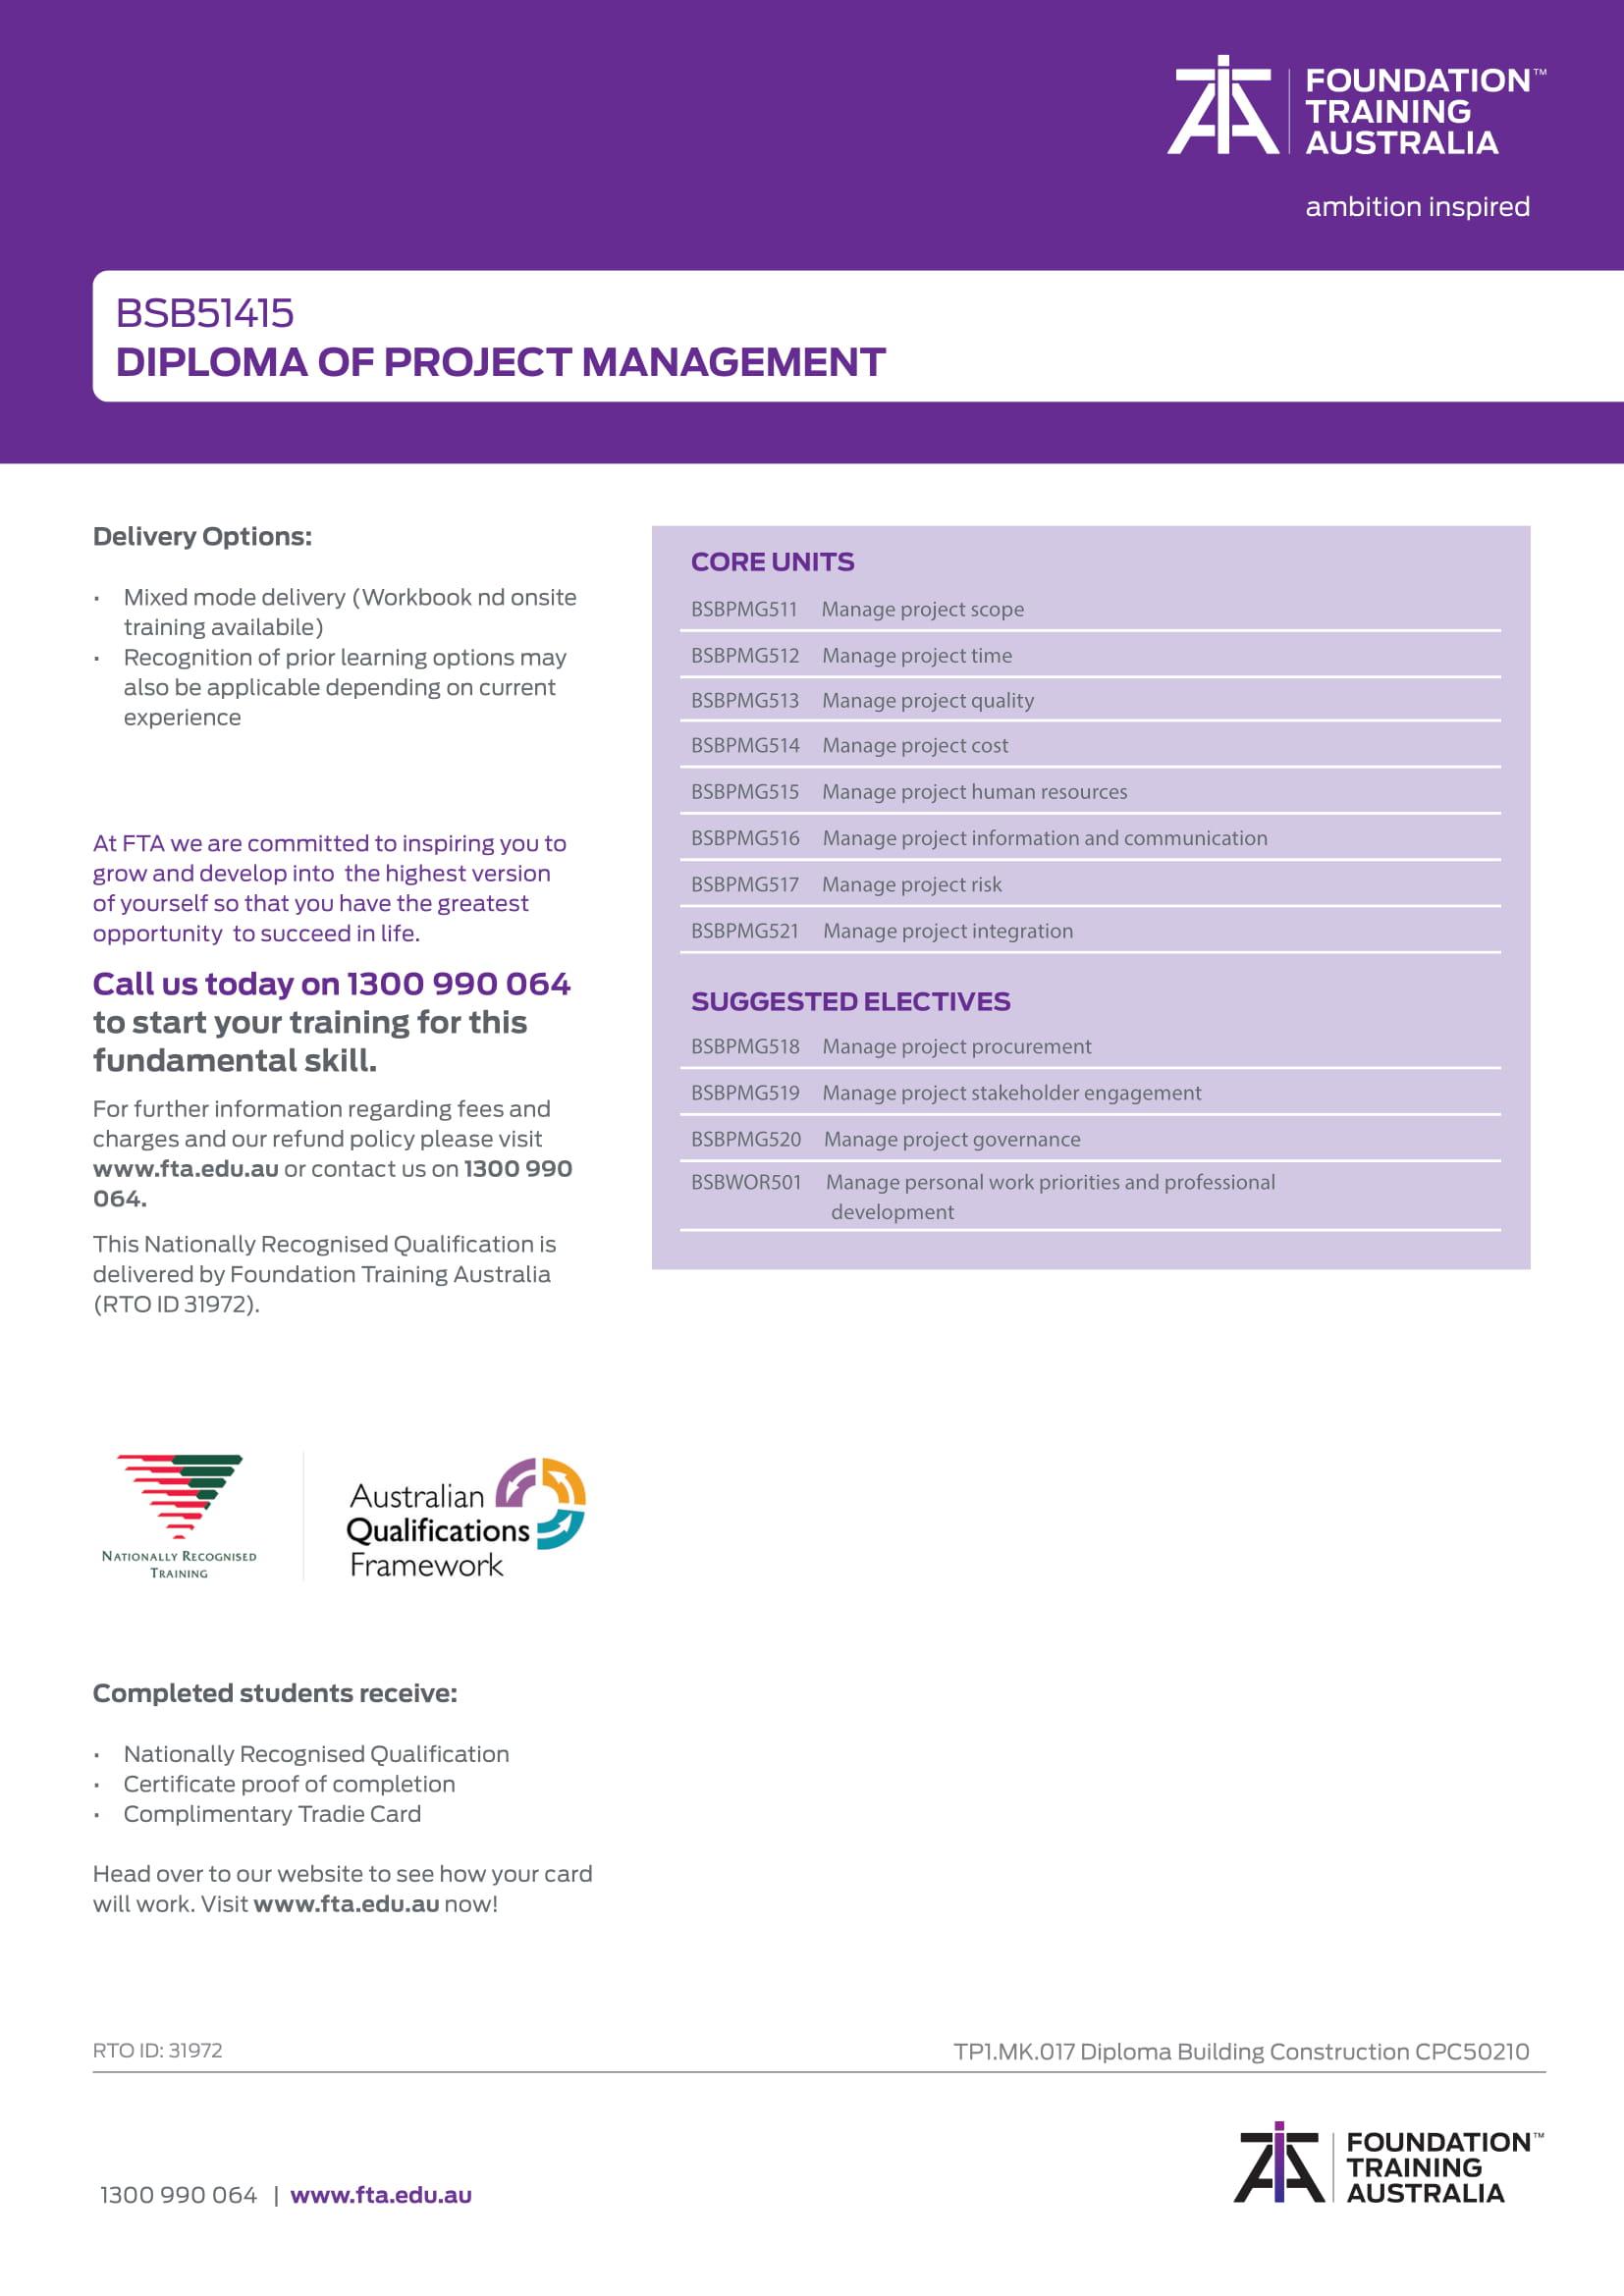 https://www.fta.edu.au/wp-content/uploads/2020/06/TP1.MK_.015-Diploma-of-Project-Management-BSB51415-2.jpg